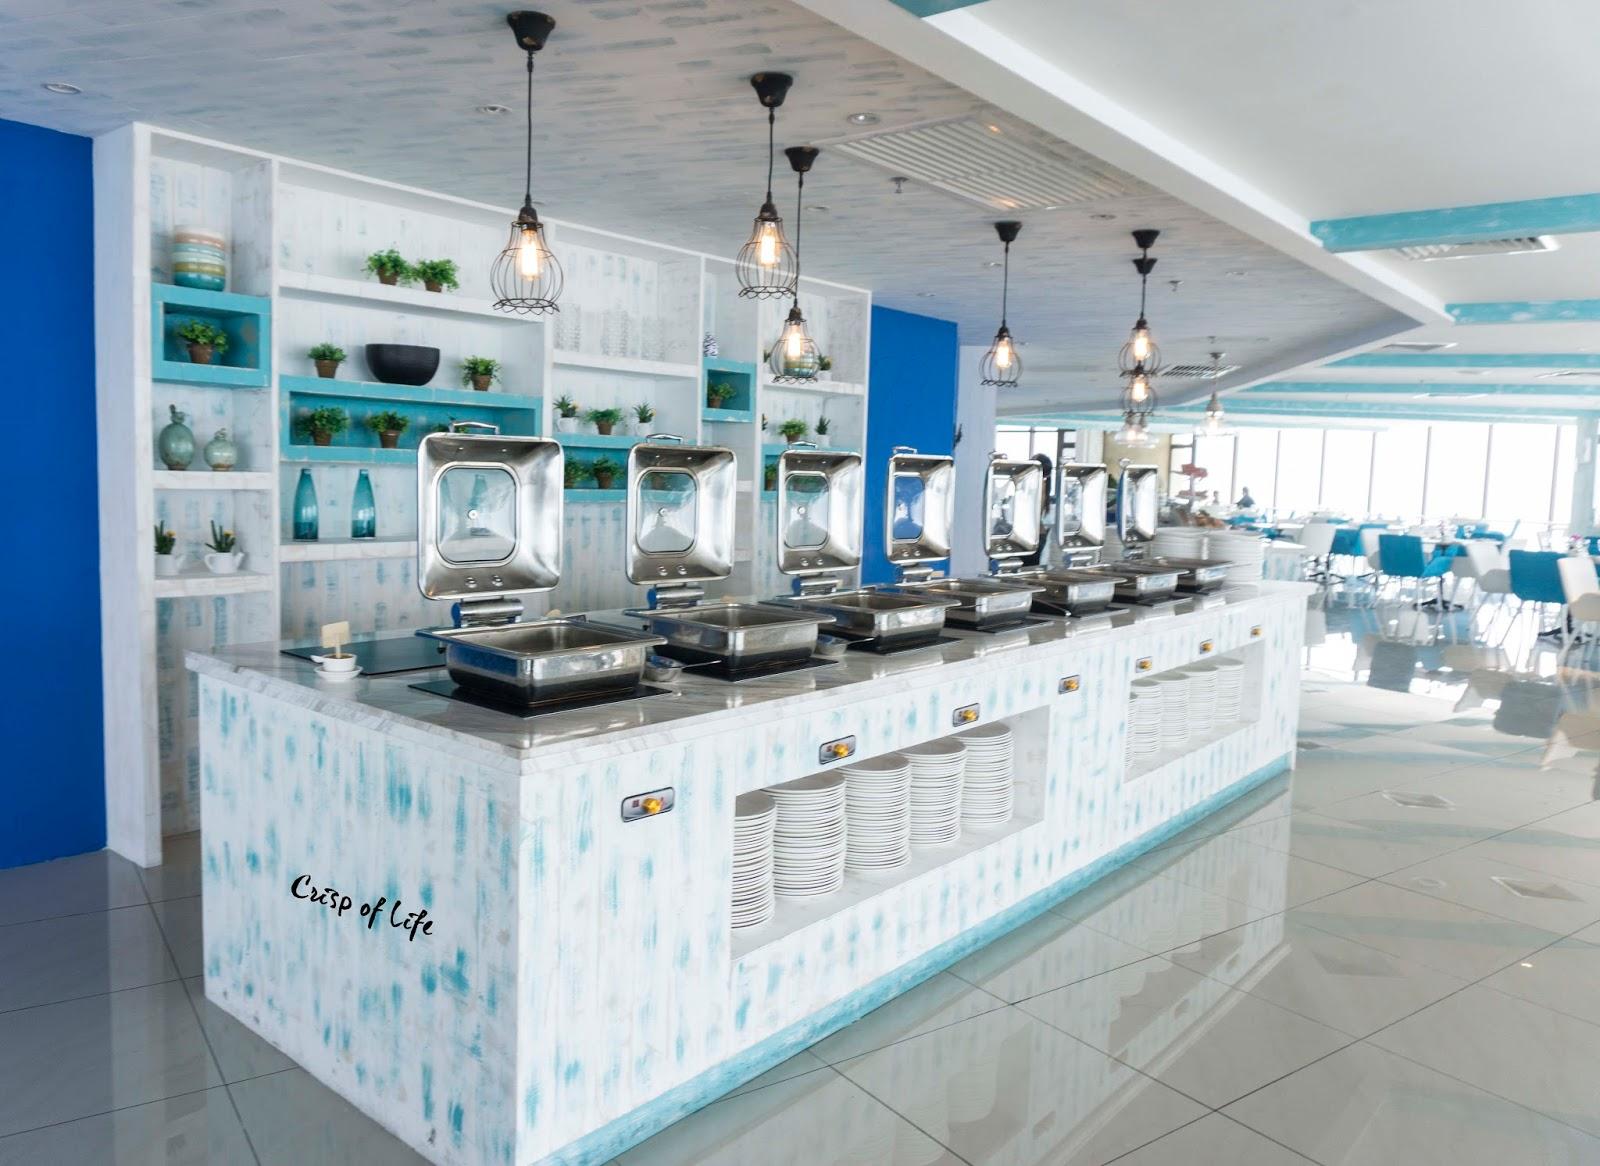 59 Dining Room Komtar Penang